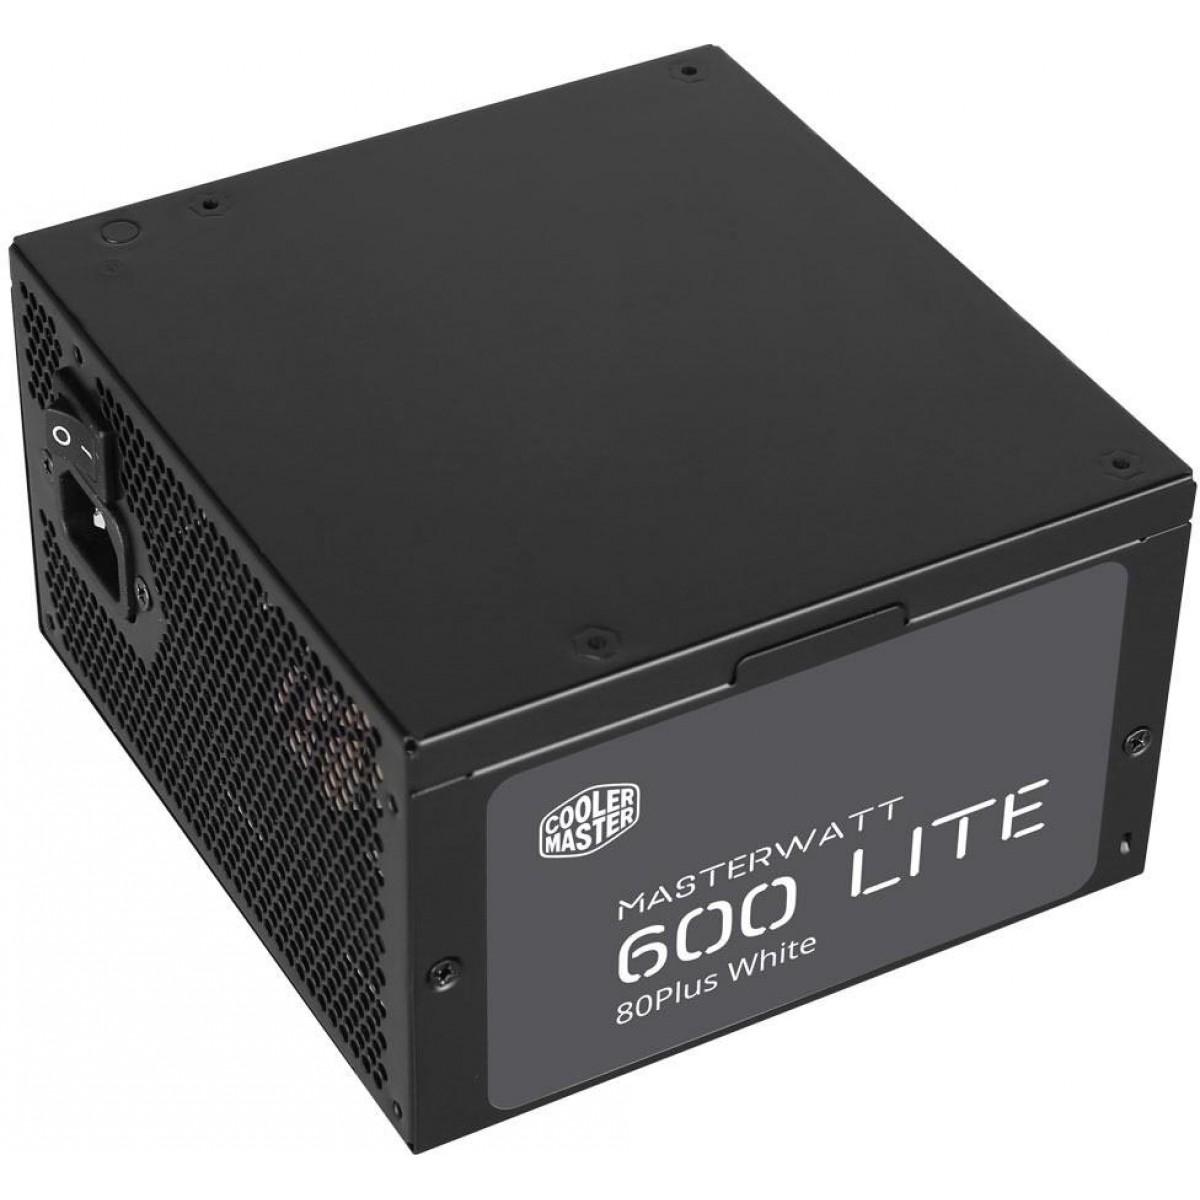 Fonte Cooler Master Masterwatt Lite 600W, 80 Plus White, PFC Ativo, MPX-6001-ACAAW-WO